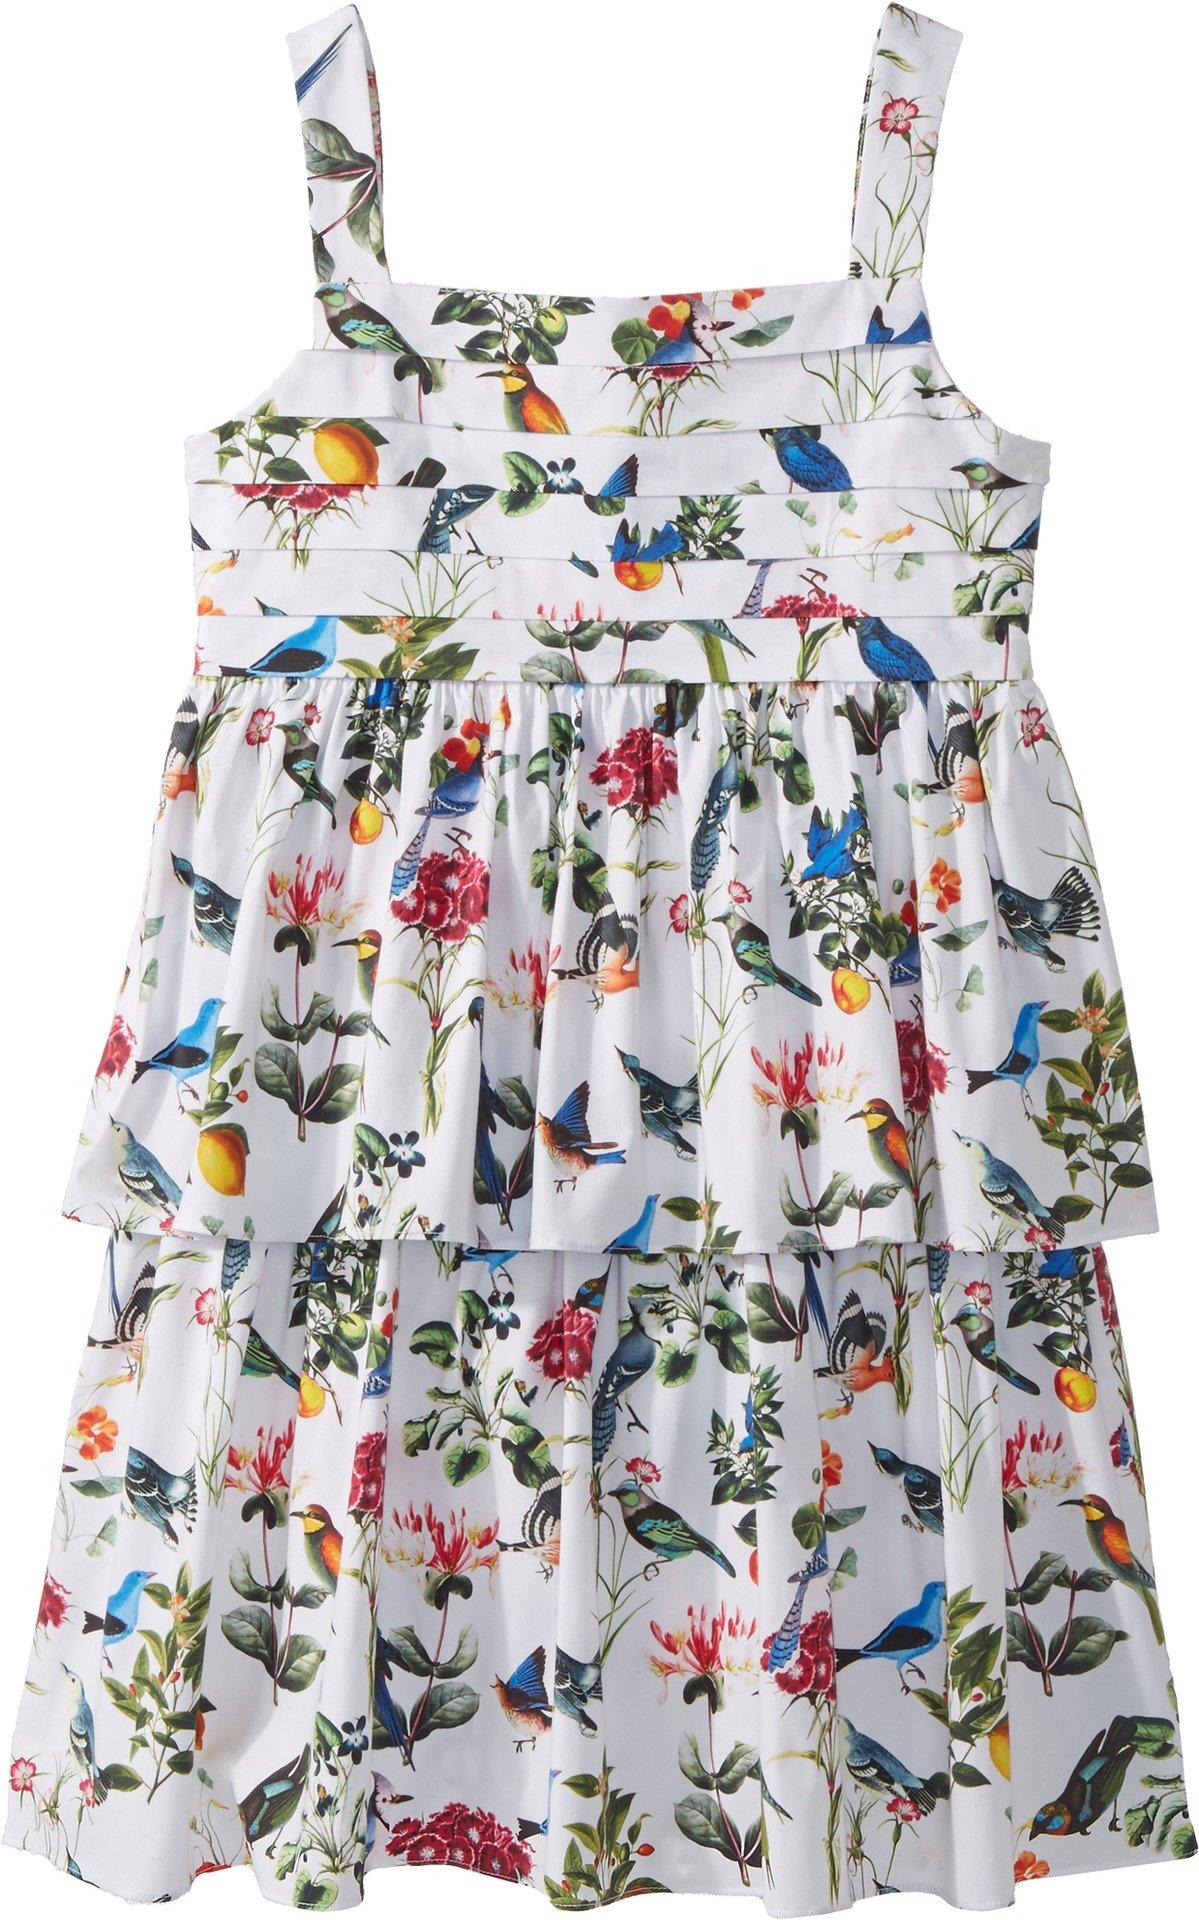 Oscar de la Renta Childrenswear Baby Girl's Cotton Botanical Birds Pleated Dress (Toddler/Little Kids/Big Kids) White Multi 12